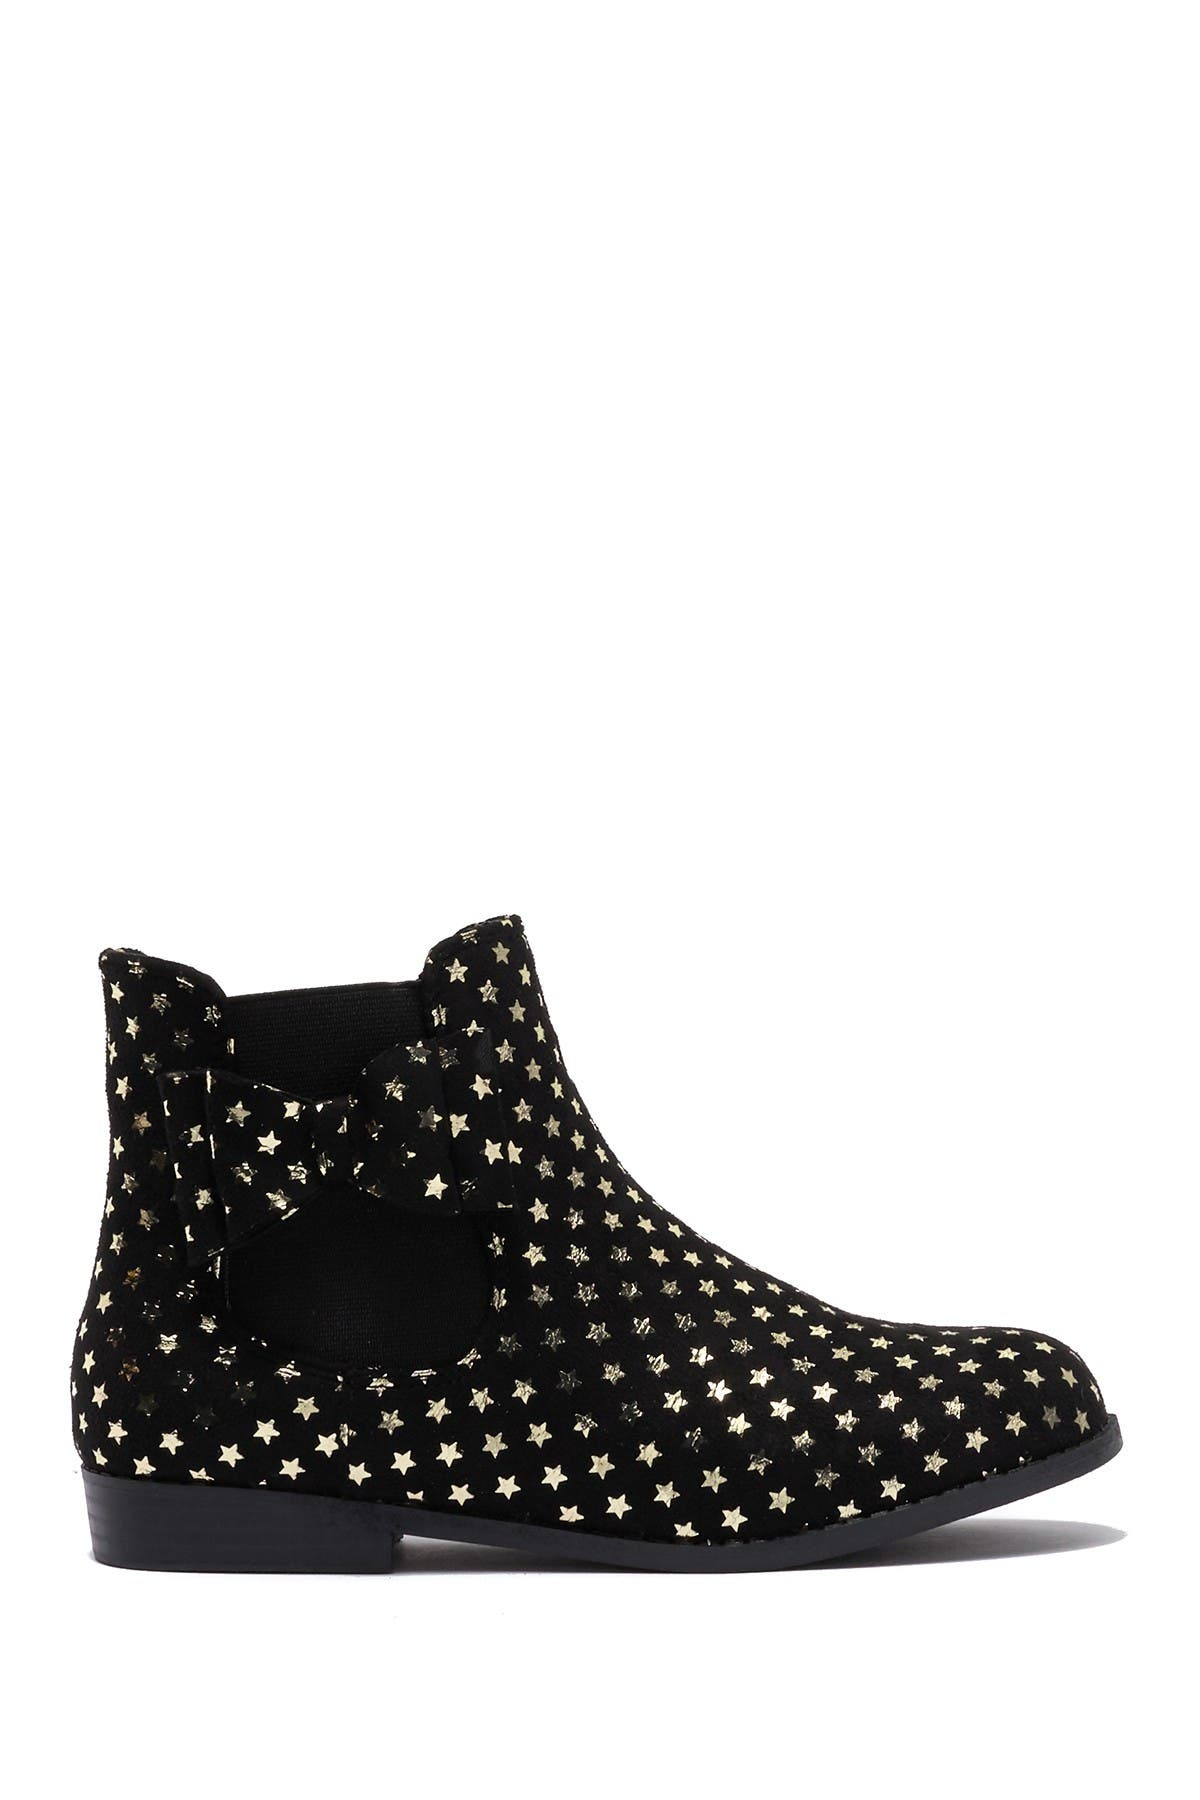 Tahari Fez Foil Print Ankle Boot